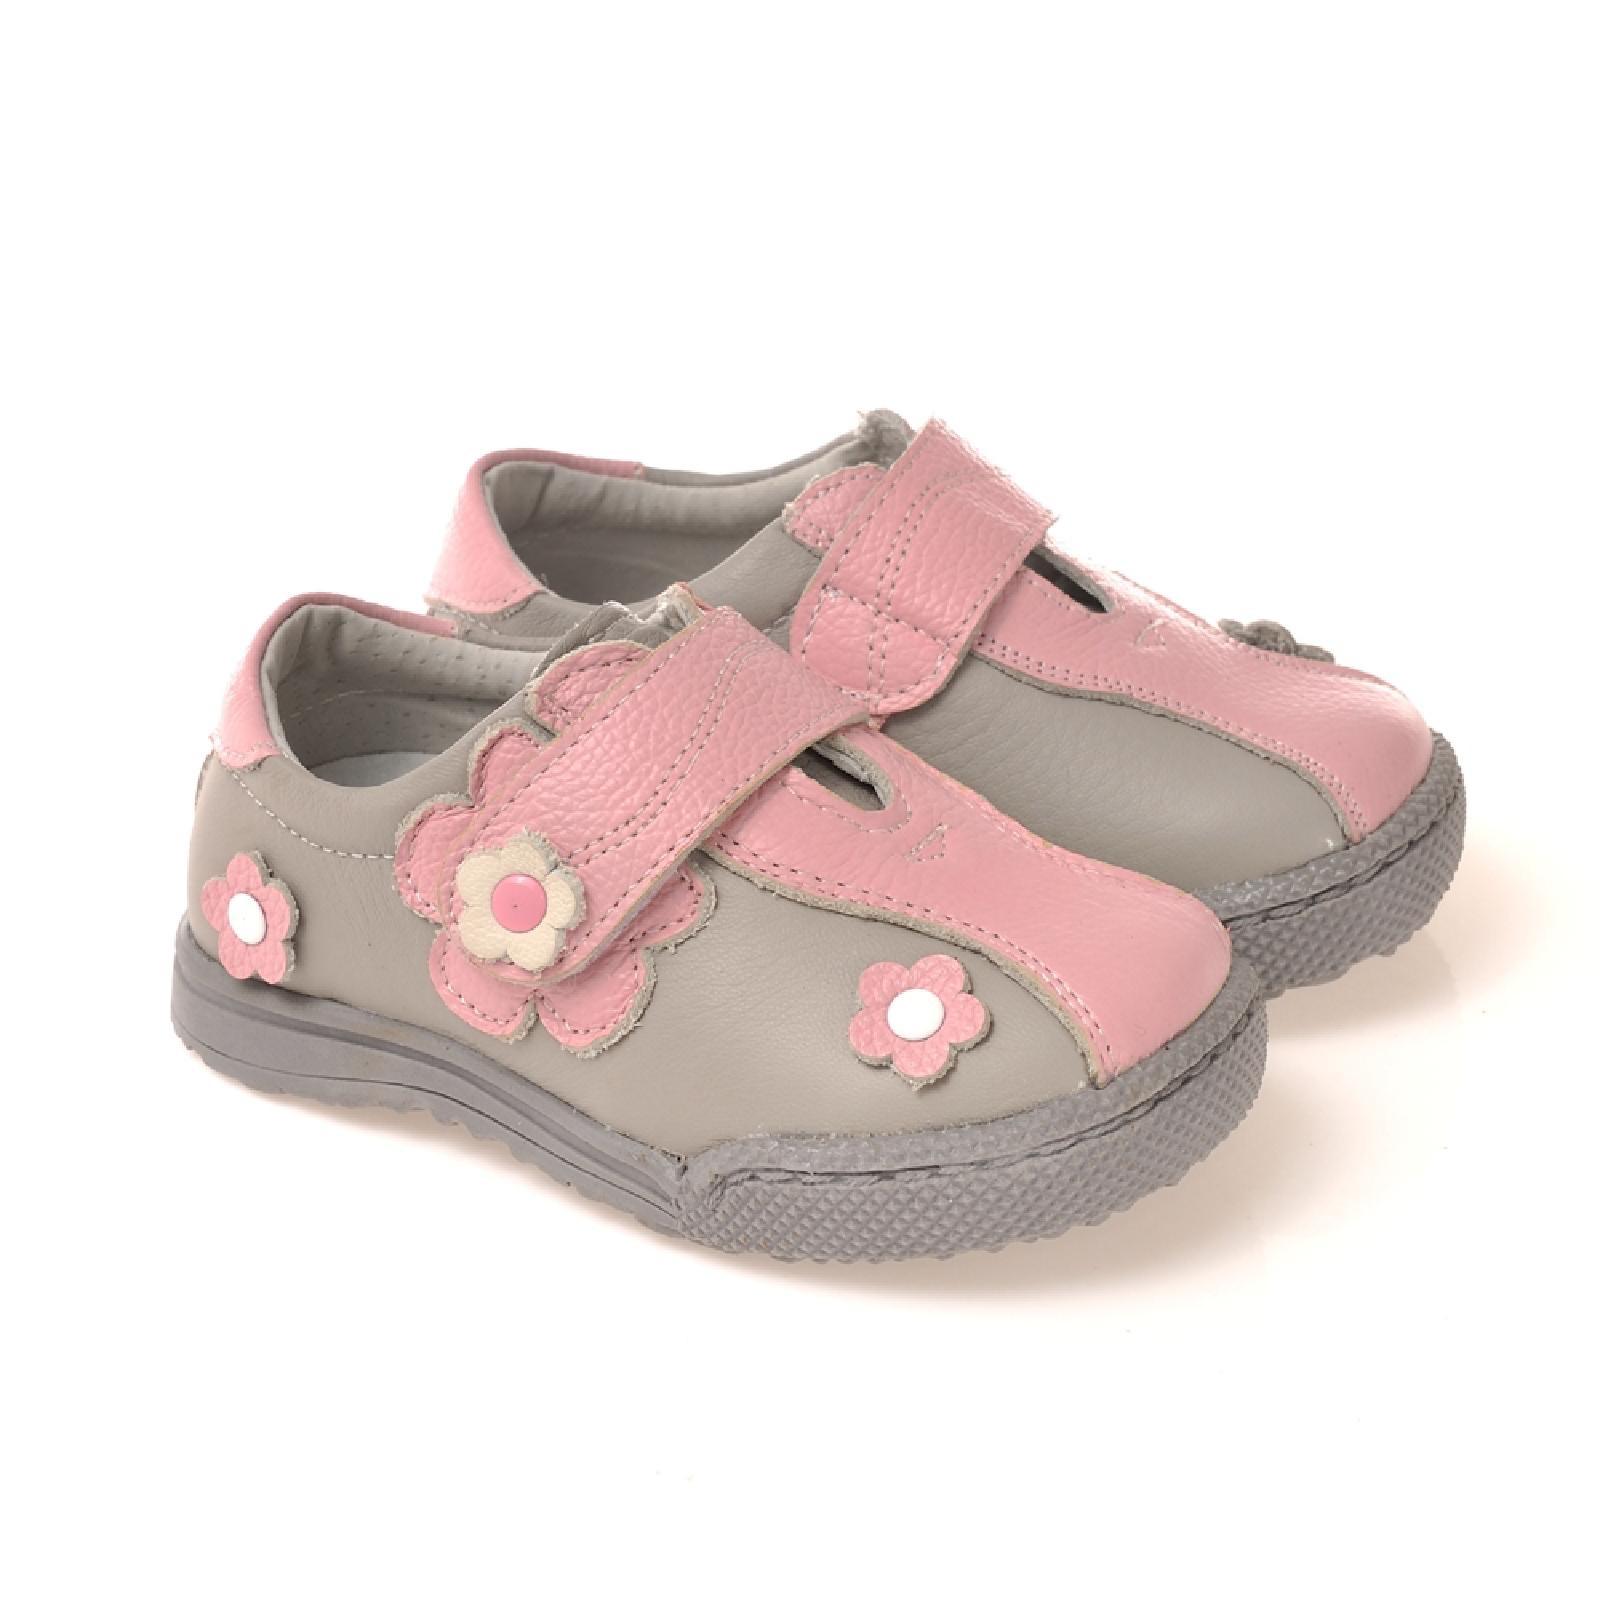 Indexbild 11 - Caroch Mädchen Sneaker Kinderschuhe Halbschuhe aus Leder